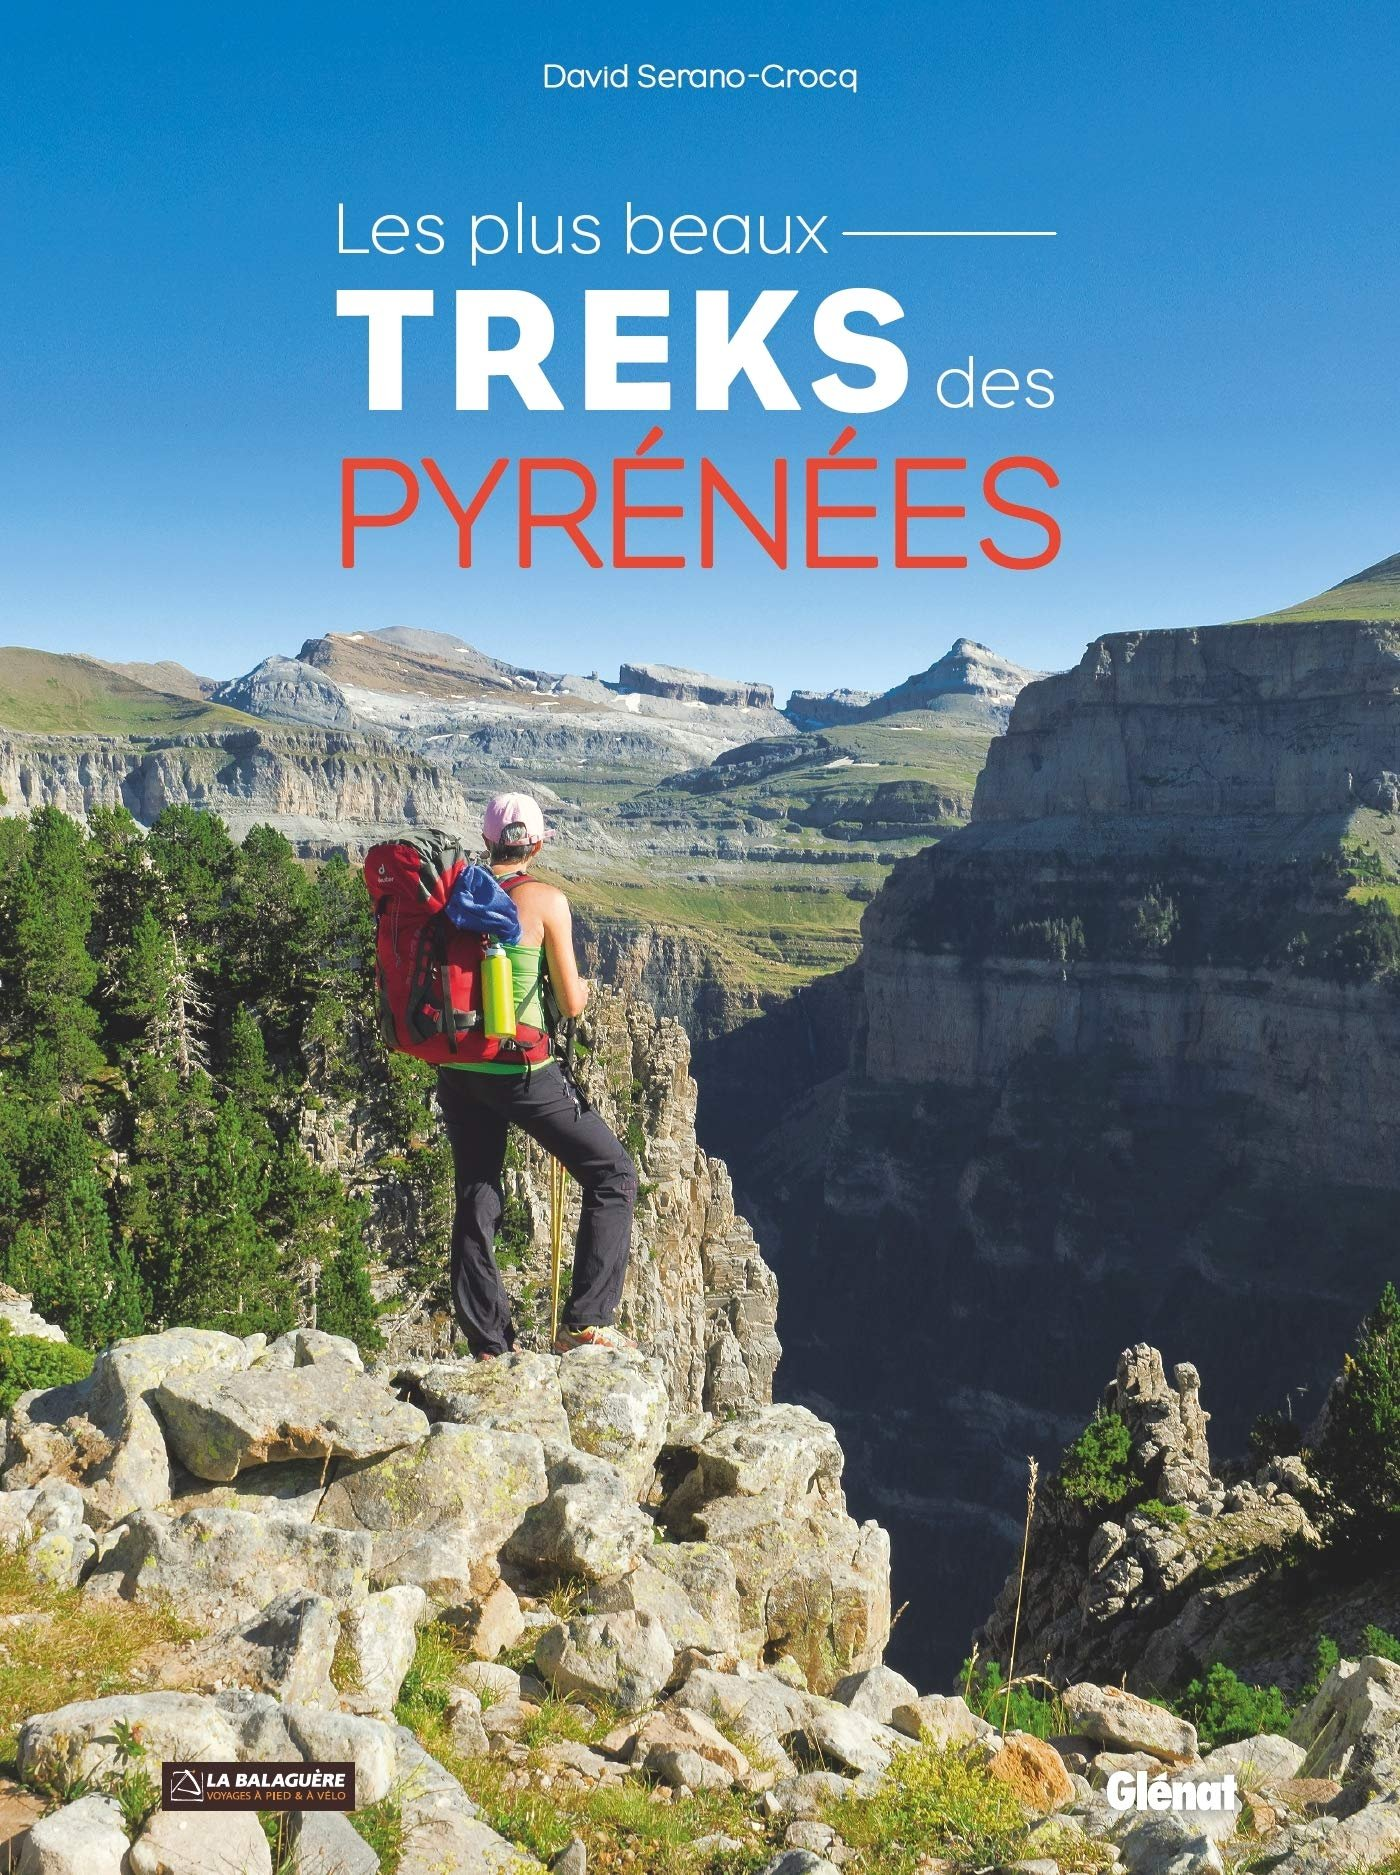 Les plus beaux treks des Pyrénées 9782344034712 David Serano-Grocq Glénat   Fotoboeken, Wandelgidsen Pyreneeën en Baskenland